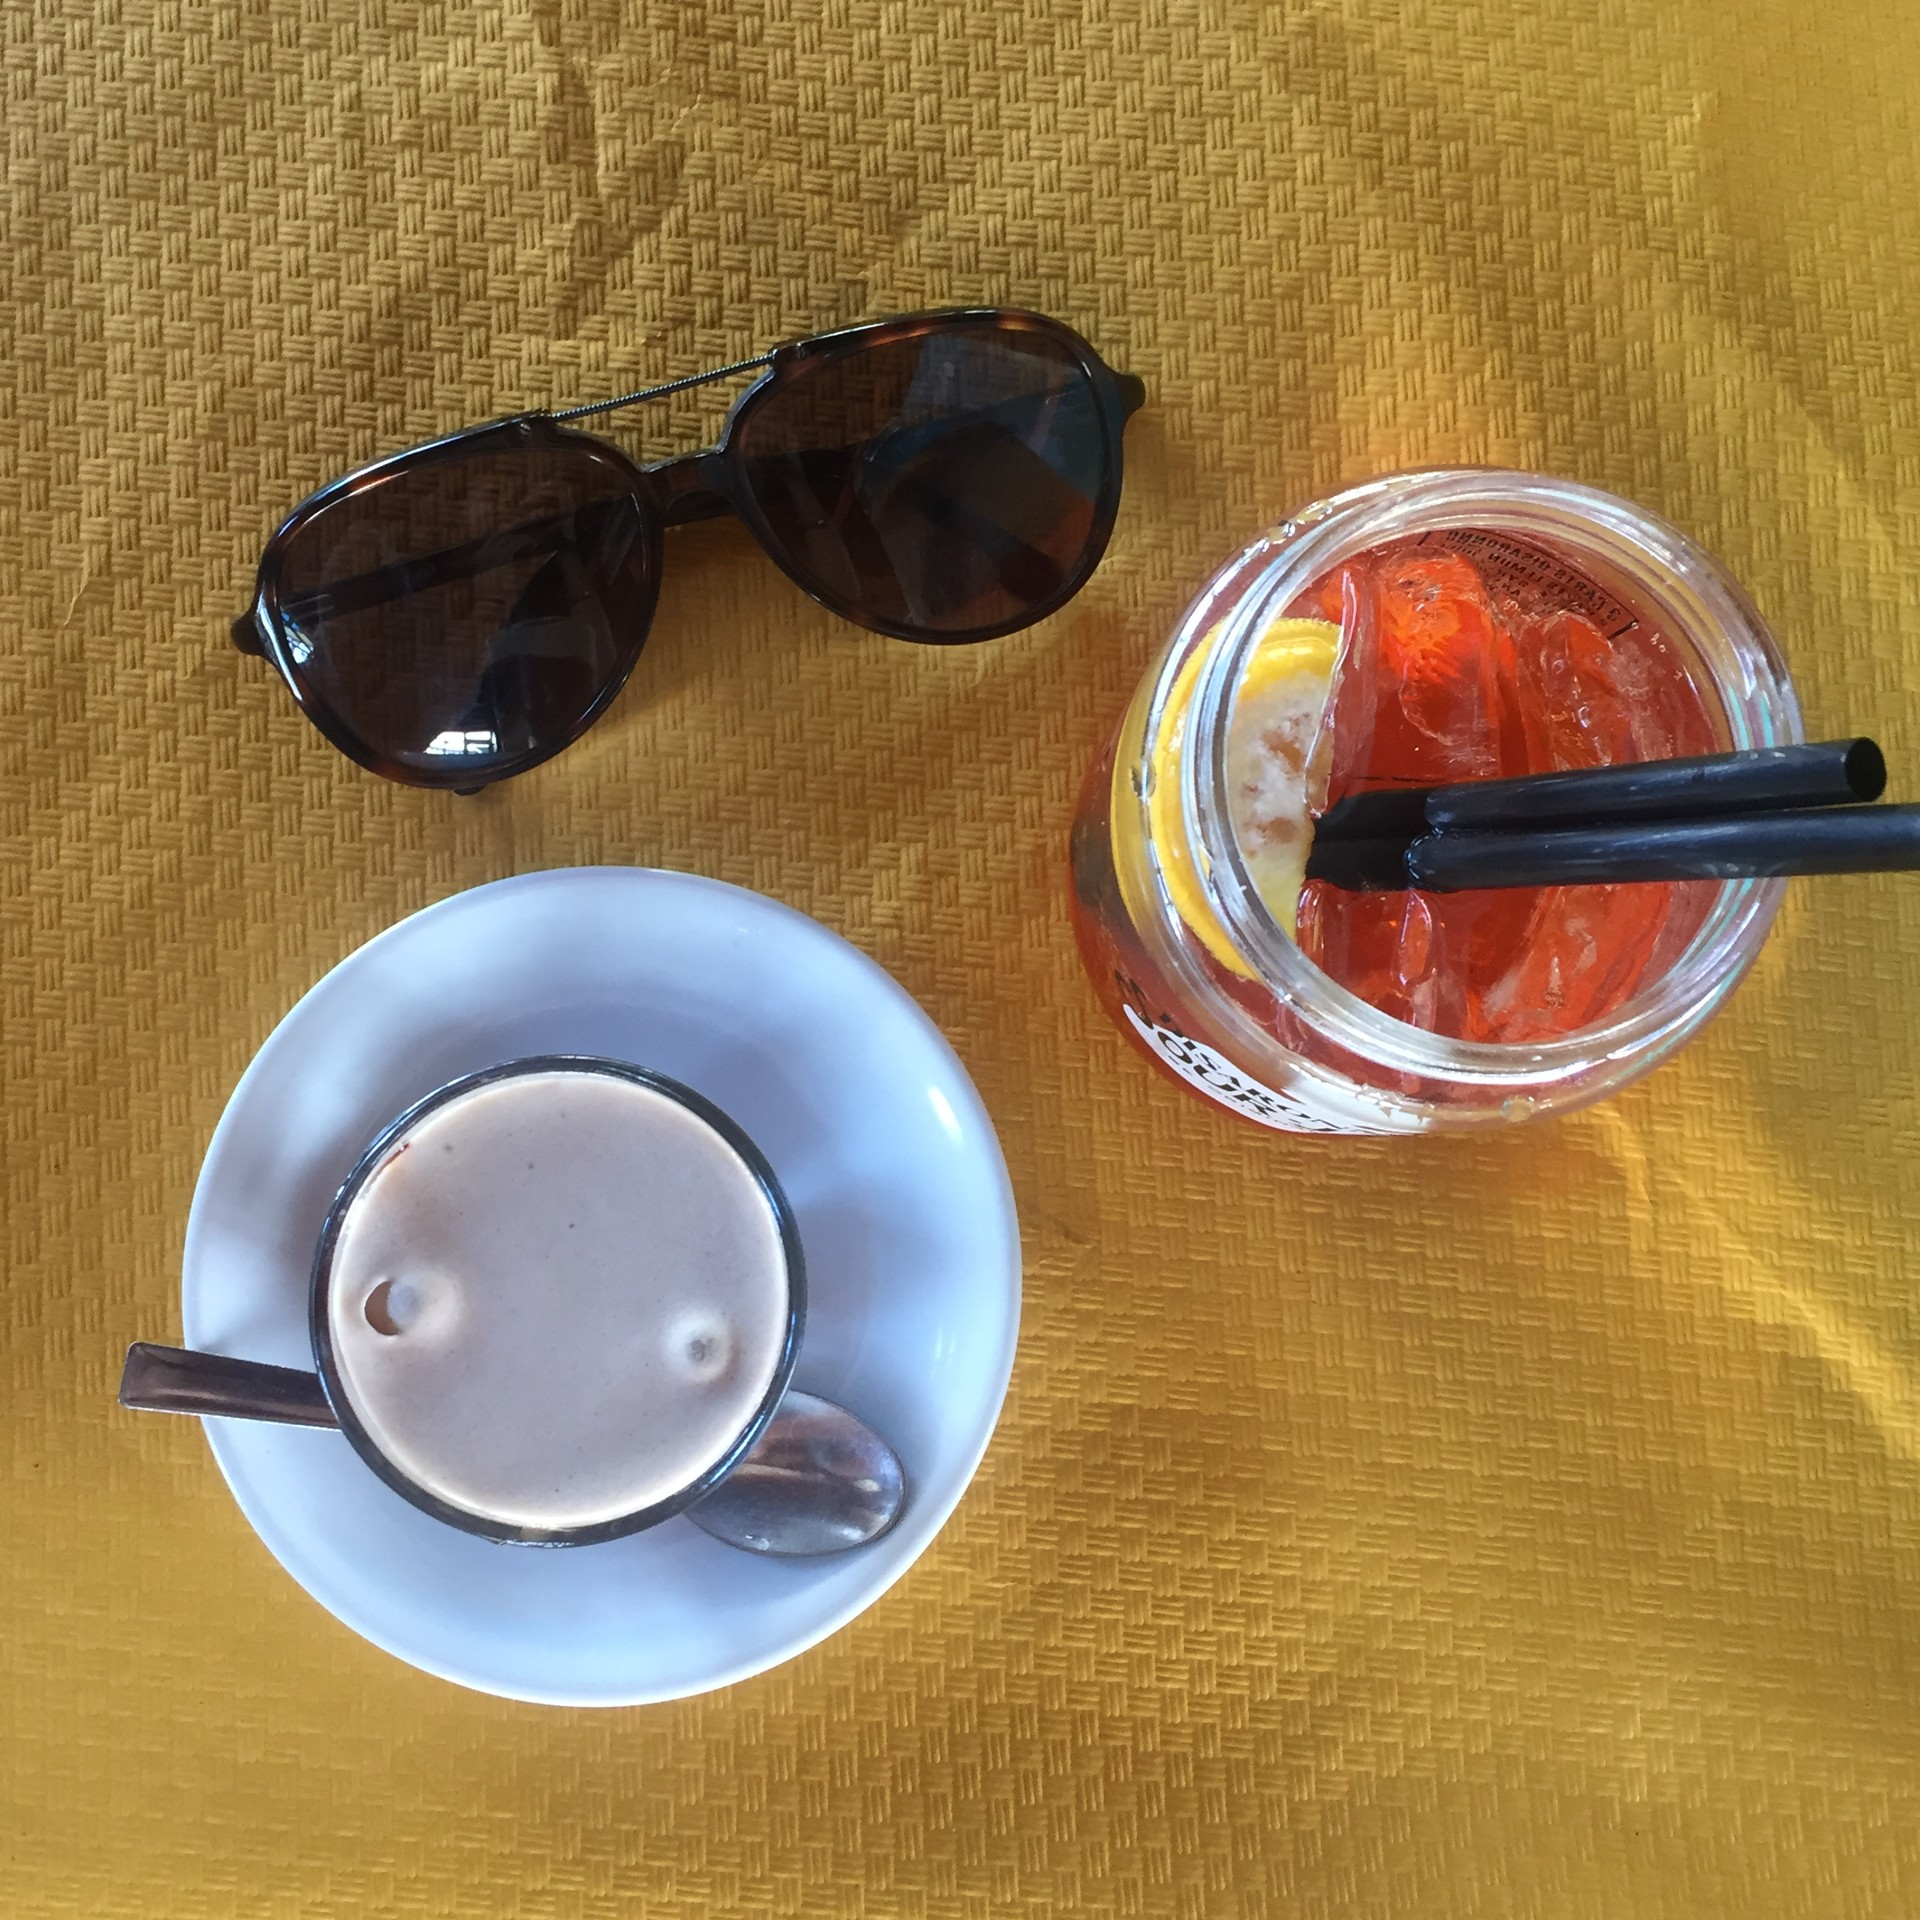 neapolitan-coffee-traditions-a1797d3f5b2